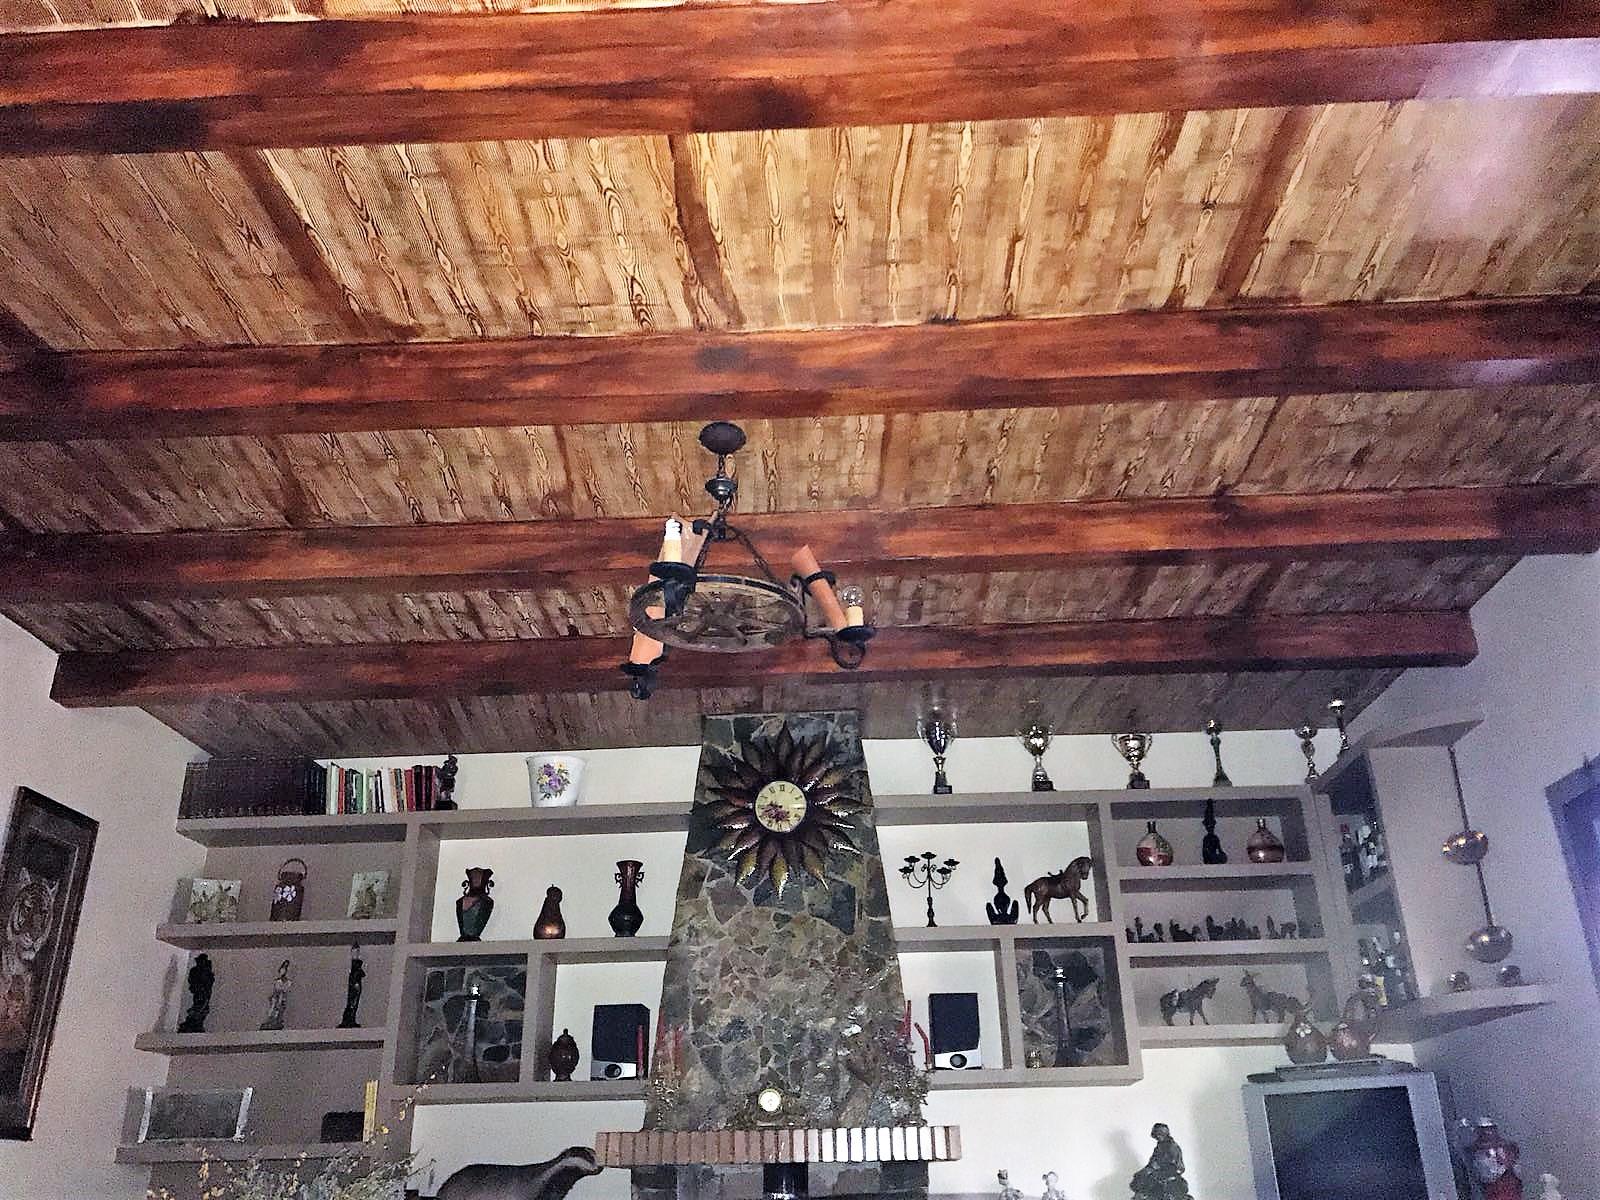 ESPAÑA ALMACEN DISTRIBUCION AISLAMIENTOS PLADUR EXTREMADURA CASLE